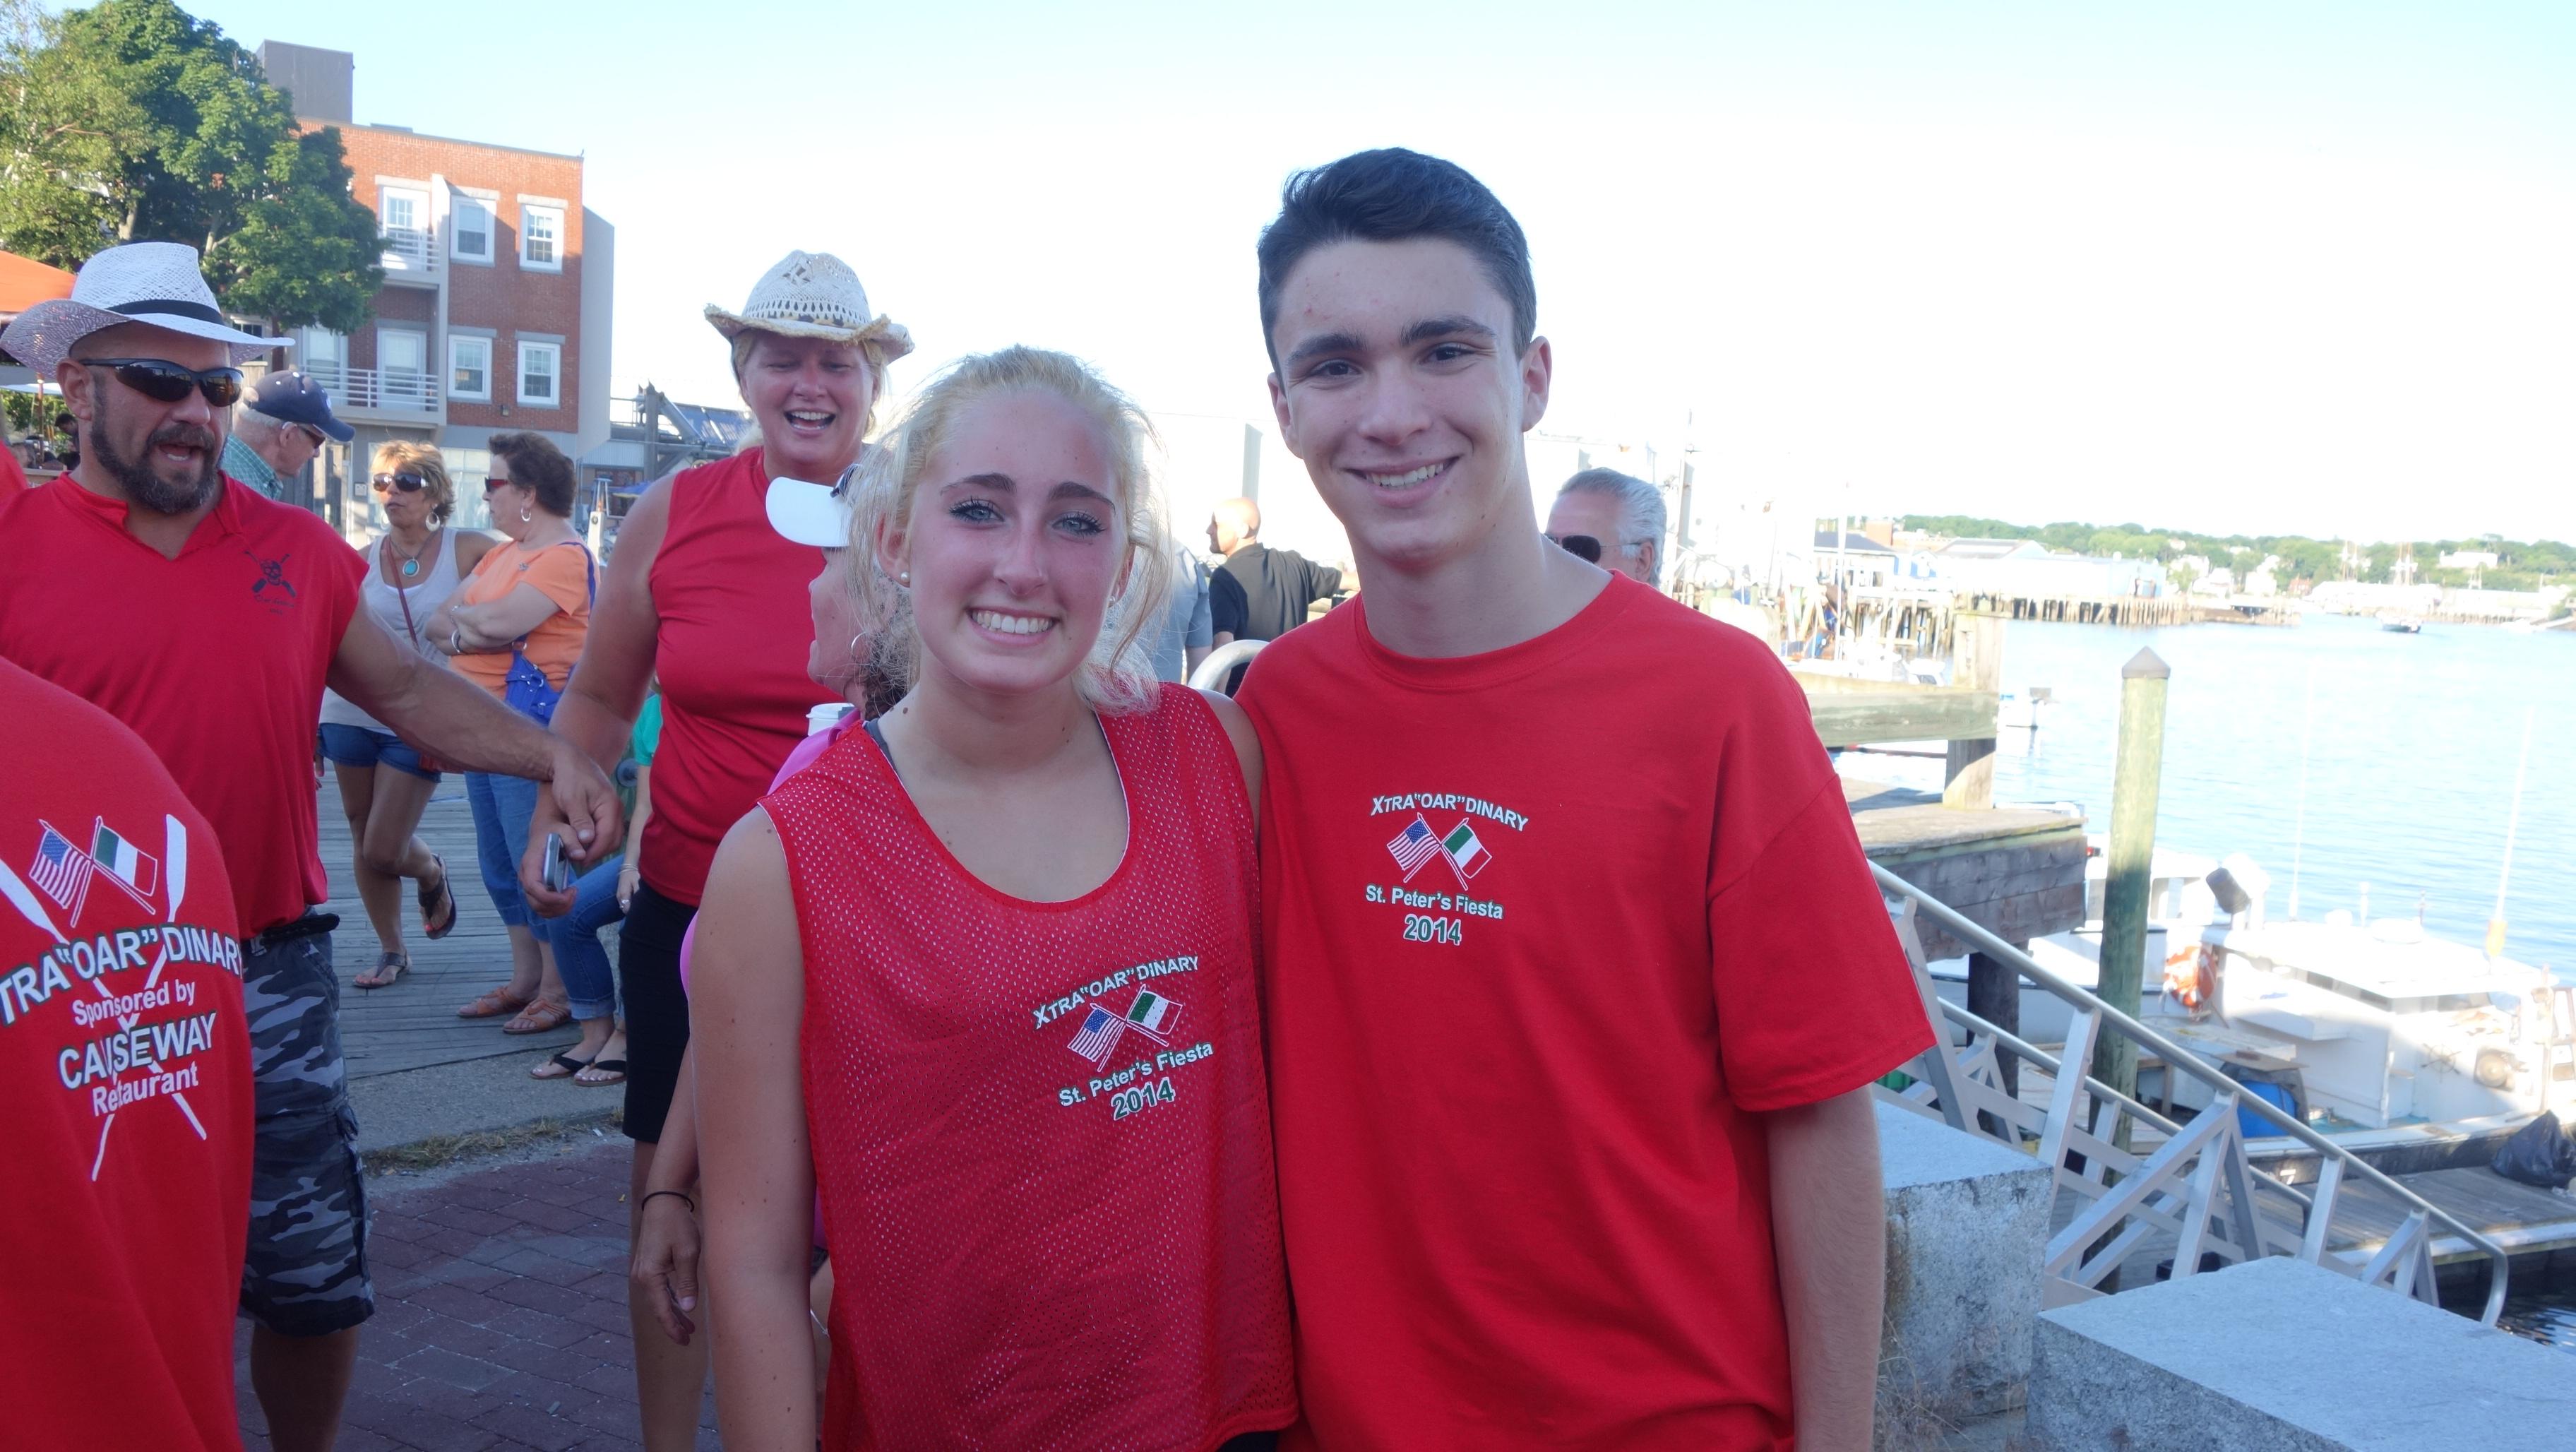 Amanda Race St. Peter's Fiesta 2014 Camps! 372